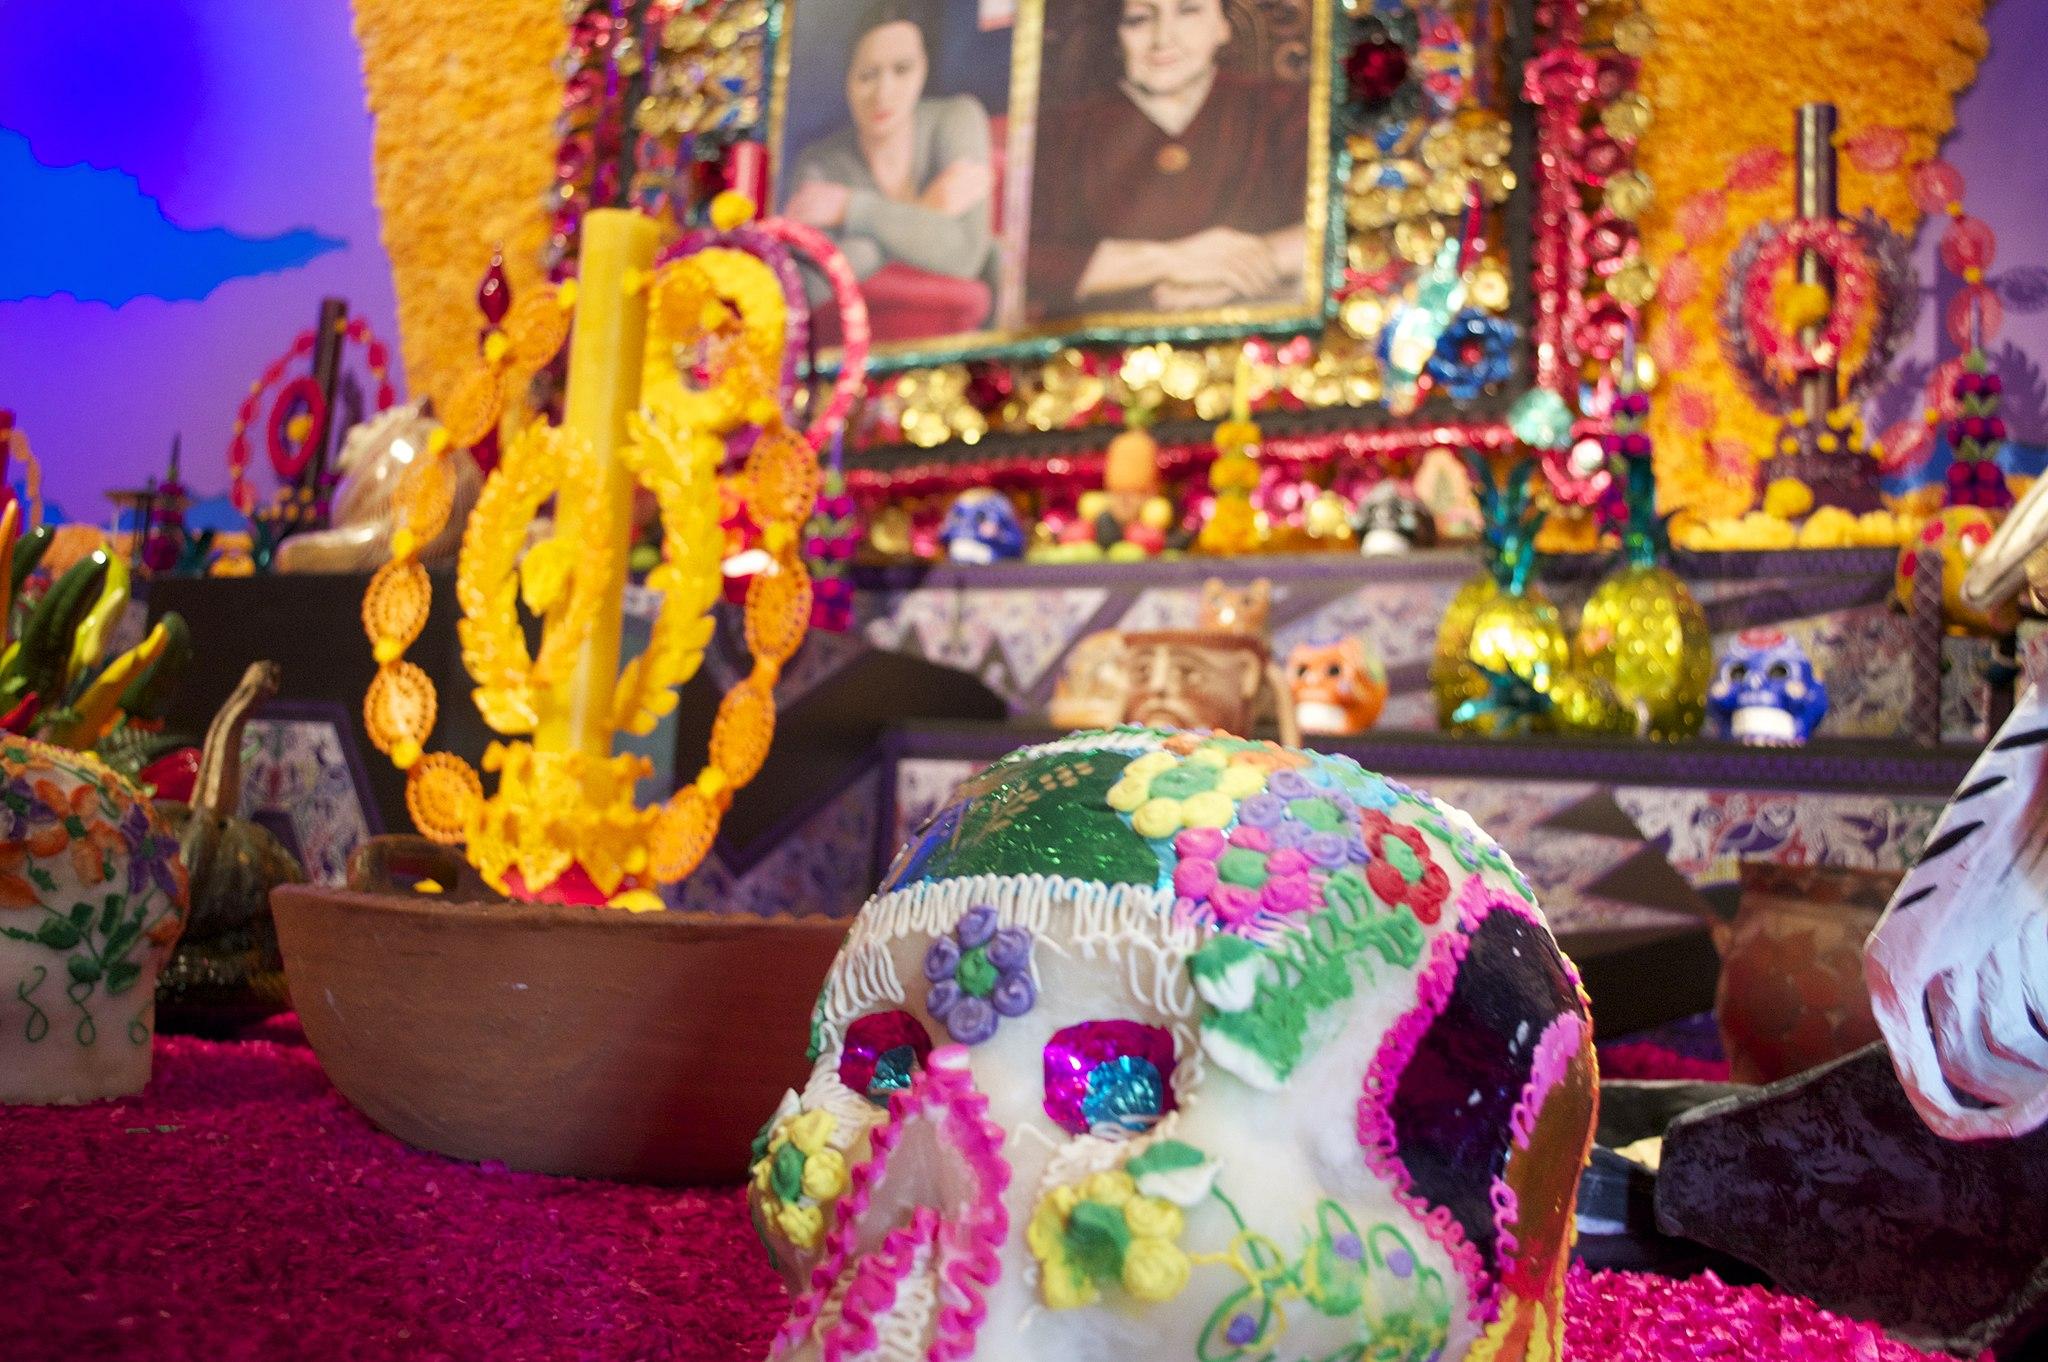 Dia_de_muertos_Candy_skull_and_altar